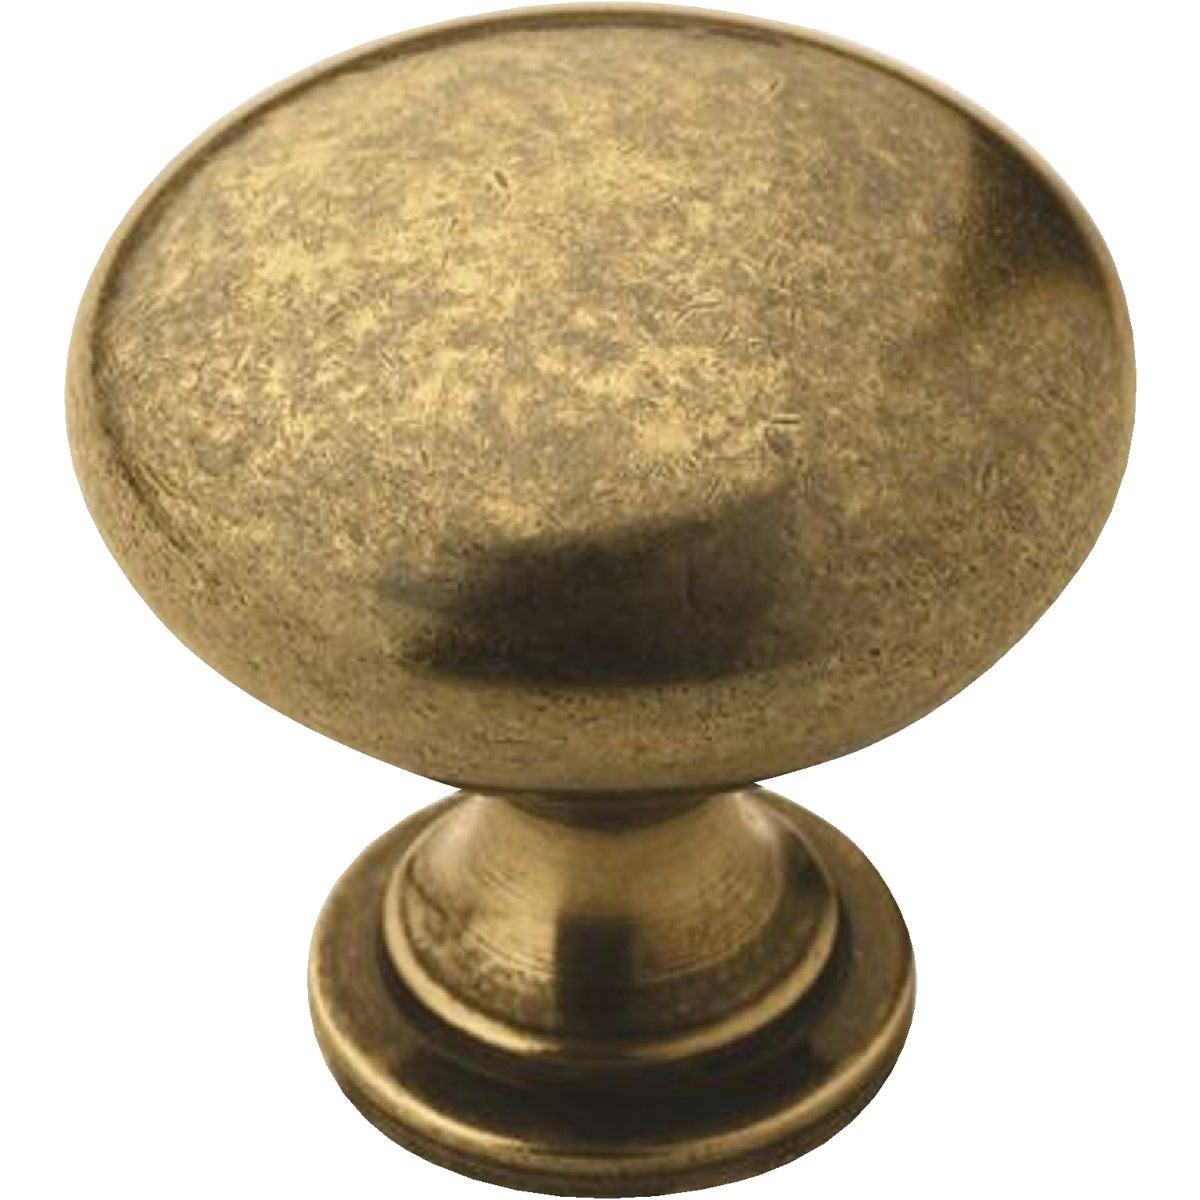 Amerock Allison Edona Burnished Brass 1-1/4 In. Cabinet Knob